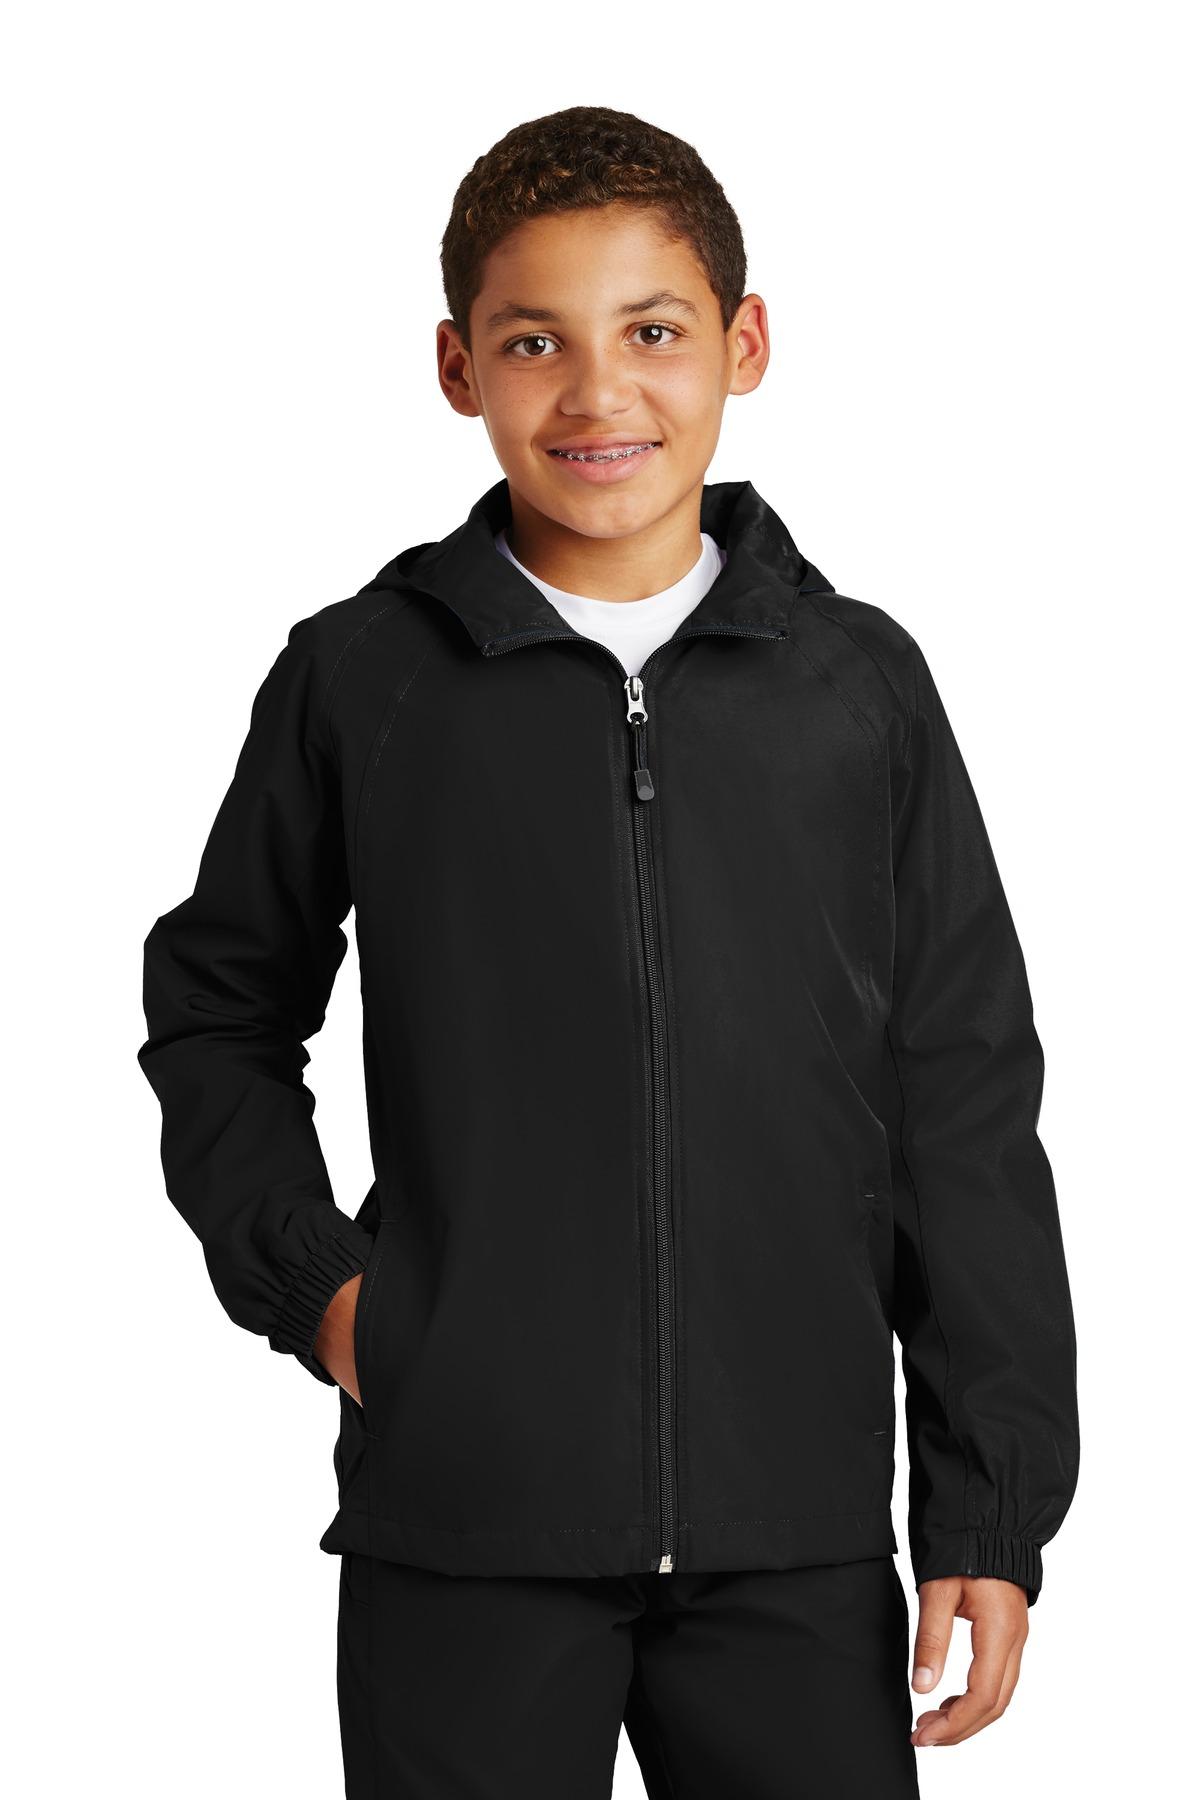 Sport-Tek Youth Stylish Sporty Hooded Raglan Sleeve Jacket Forest Green